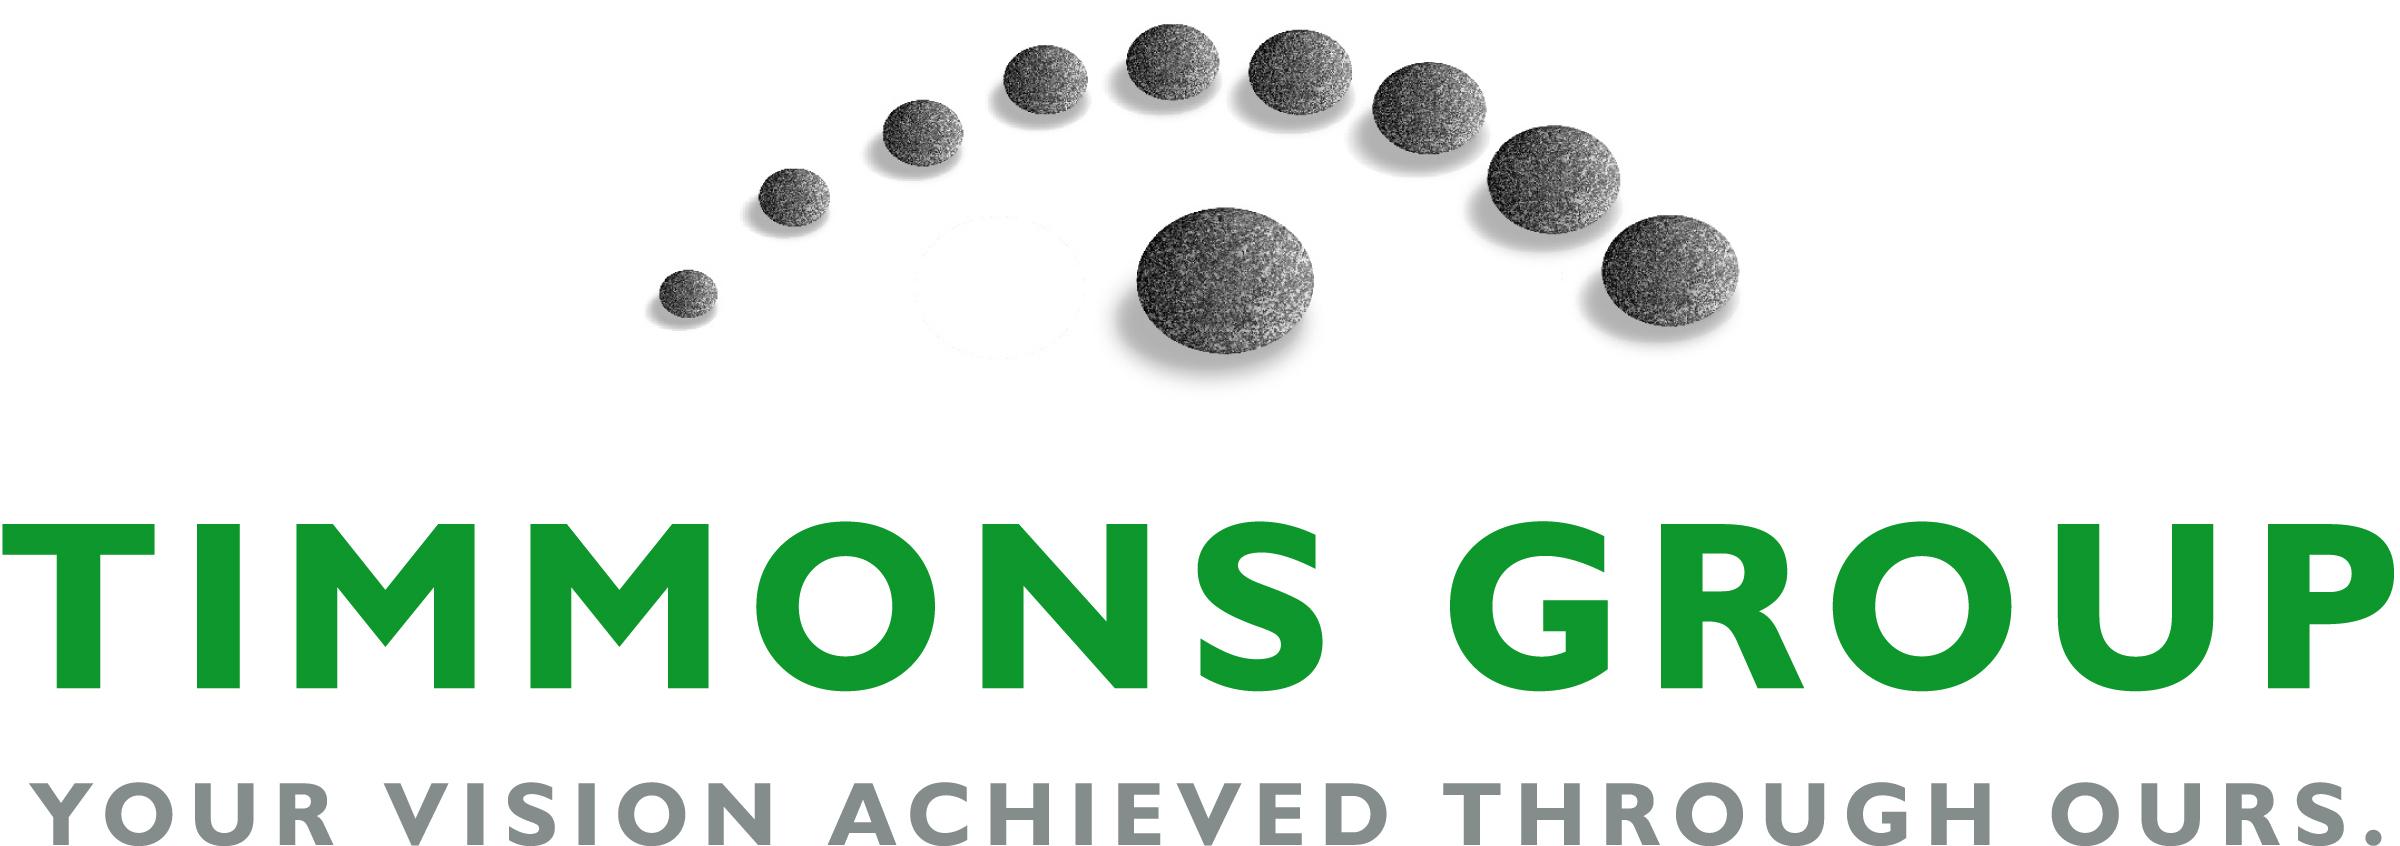 TG Green-Grey